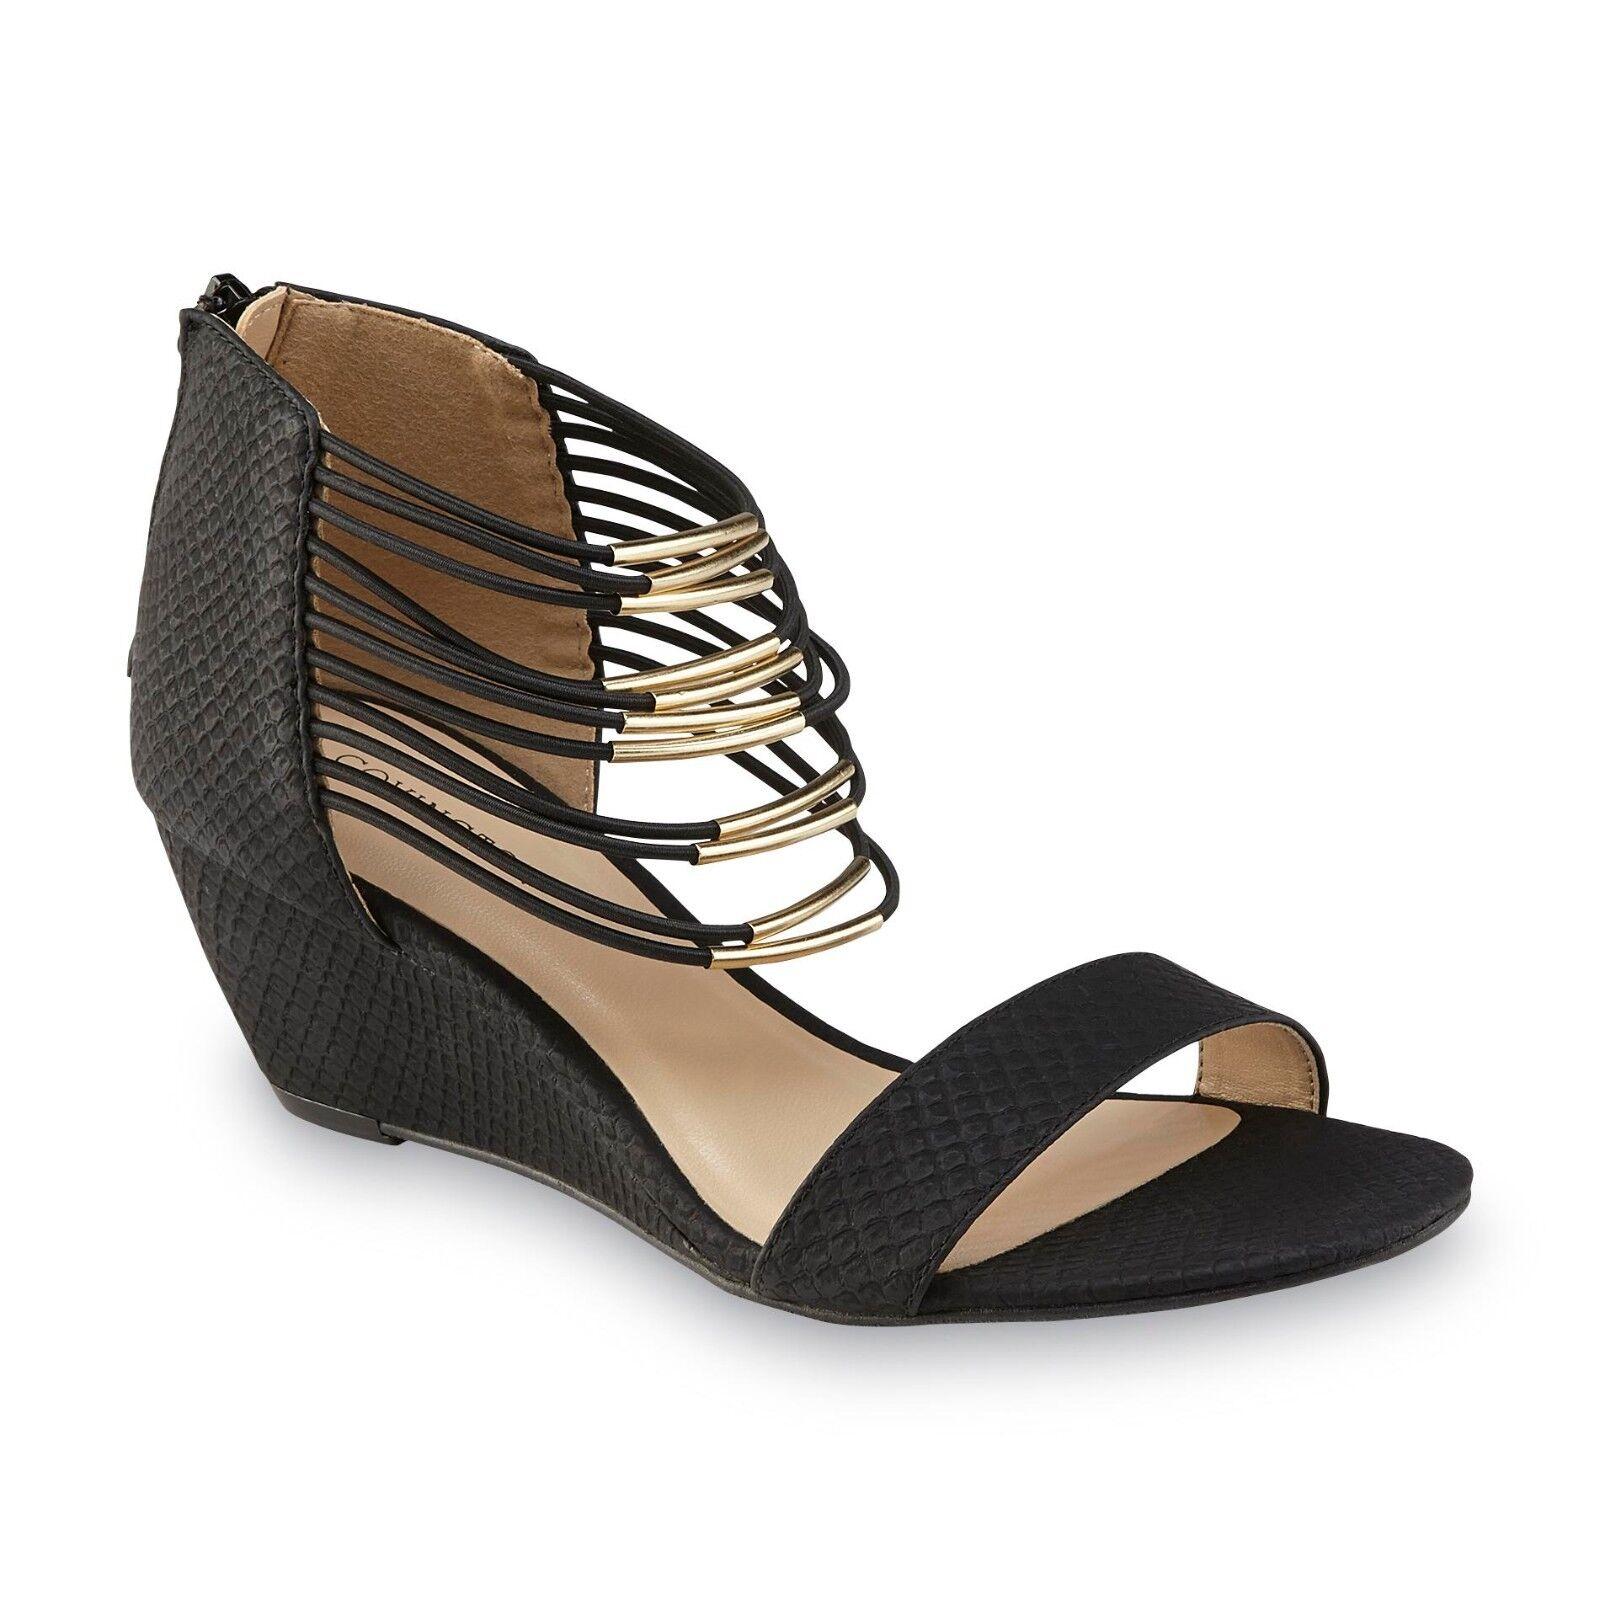 New Womens Covington Kira Wedge 173Q Sandal Style 14712 Black 173Q Wedge tr 73159c